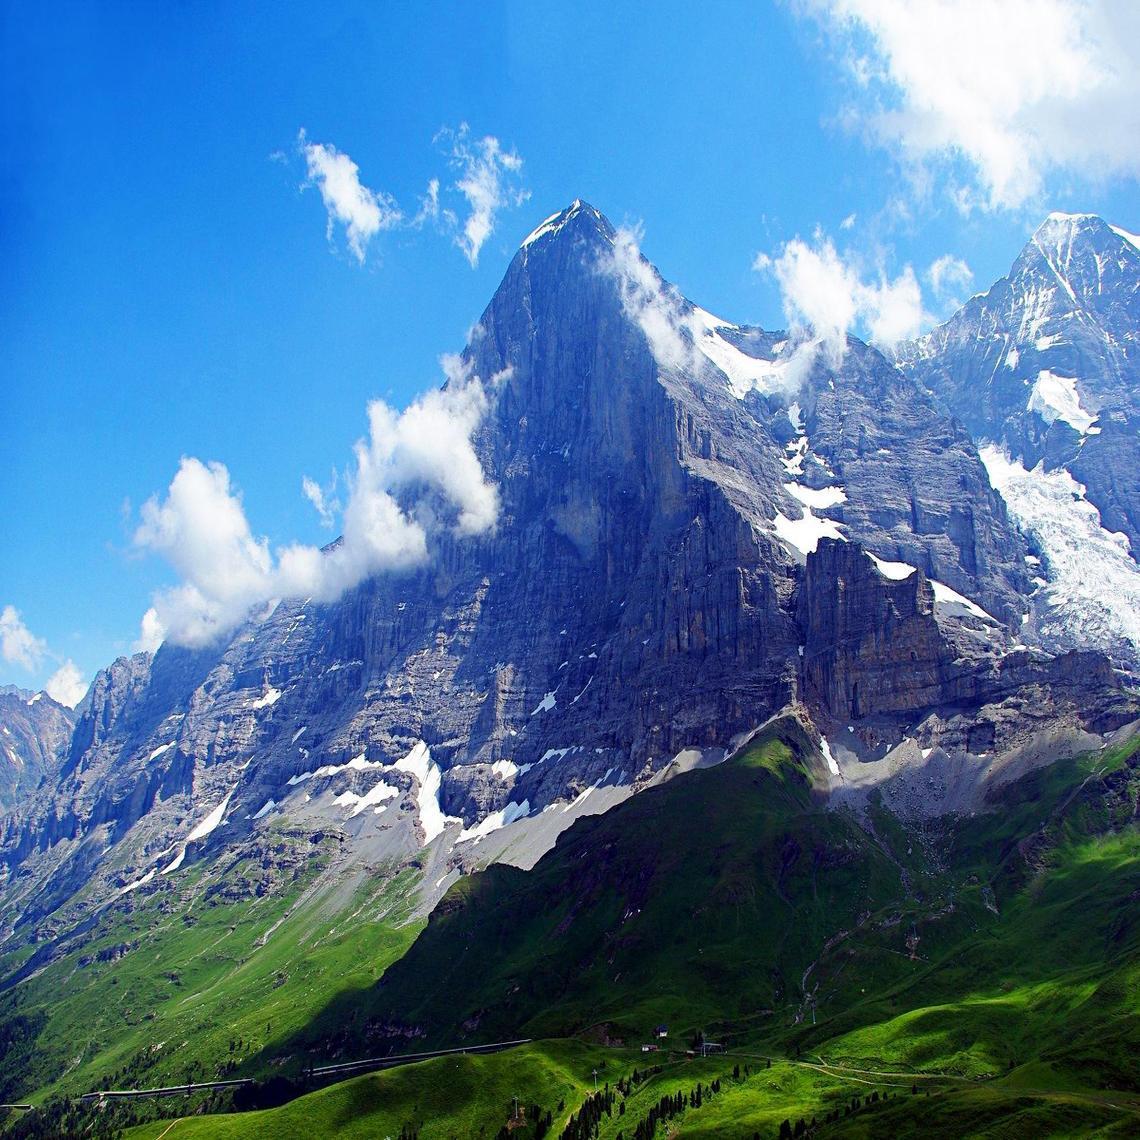 Mount Hd Wallpaper: Eiger Wallpapers